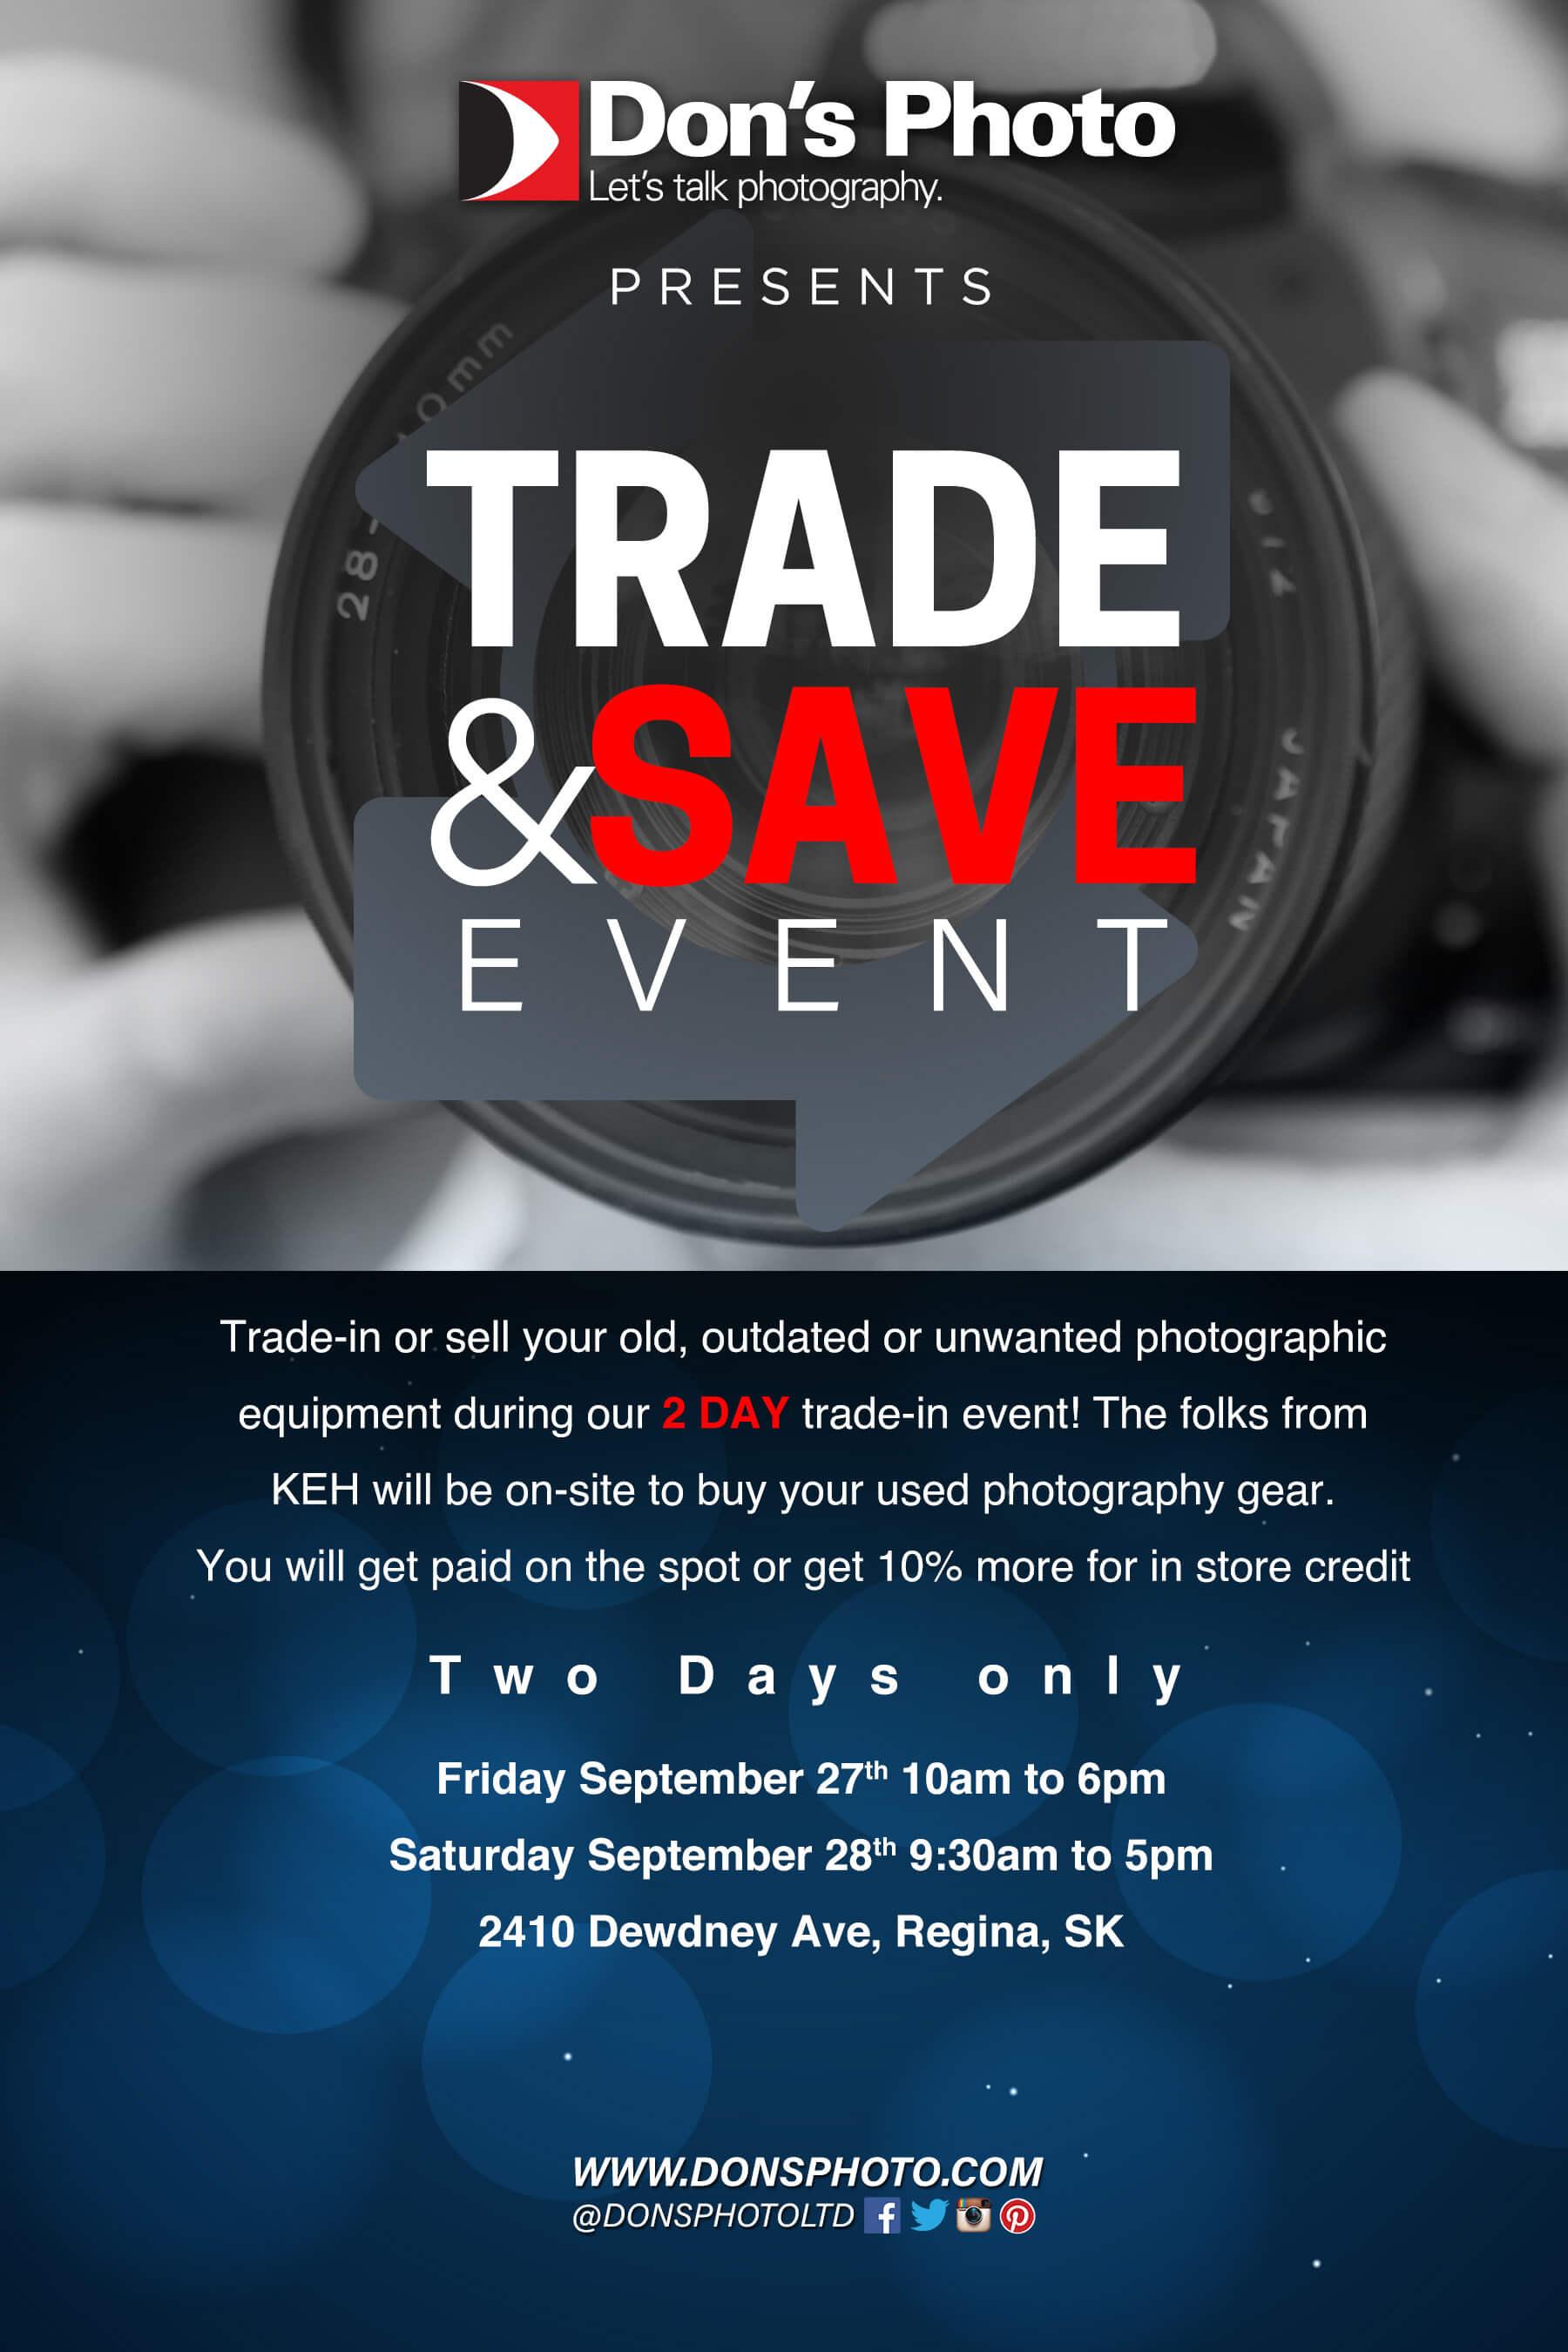 Trade & Save Event